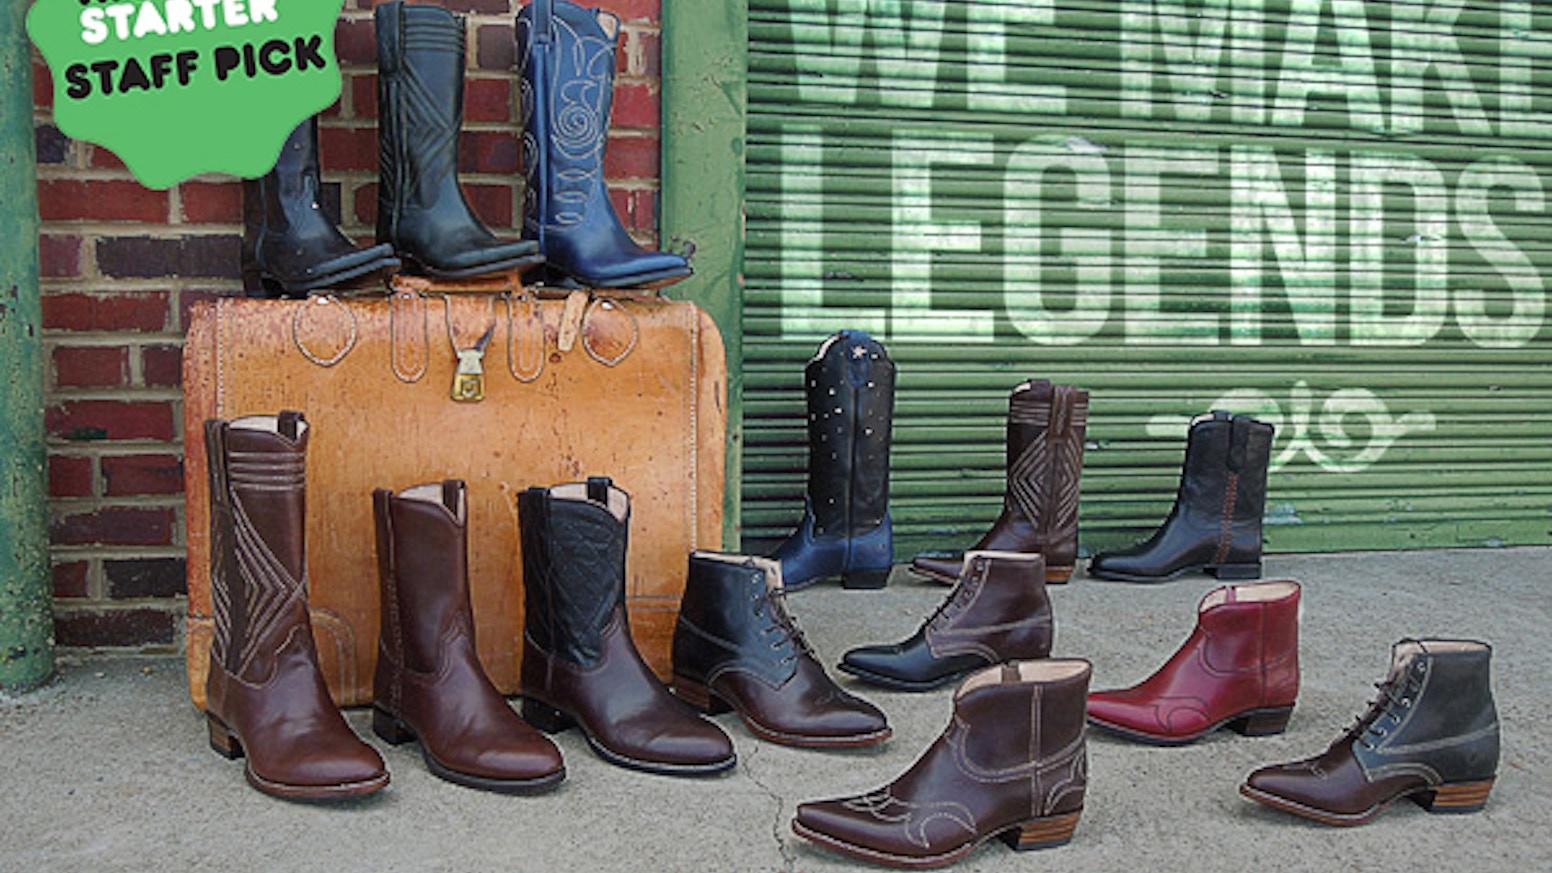 d12ad12c5b37c Ranch Road - We Make Legendary Boots by Sarah Ford — Kickstarter